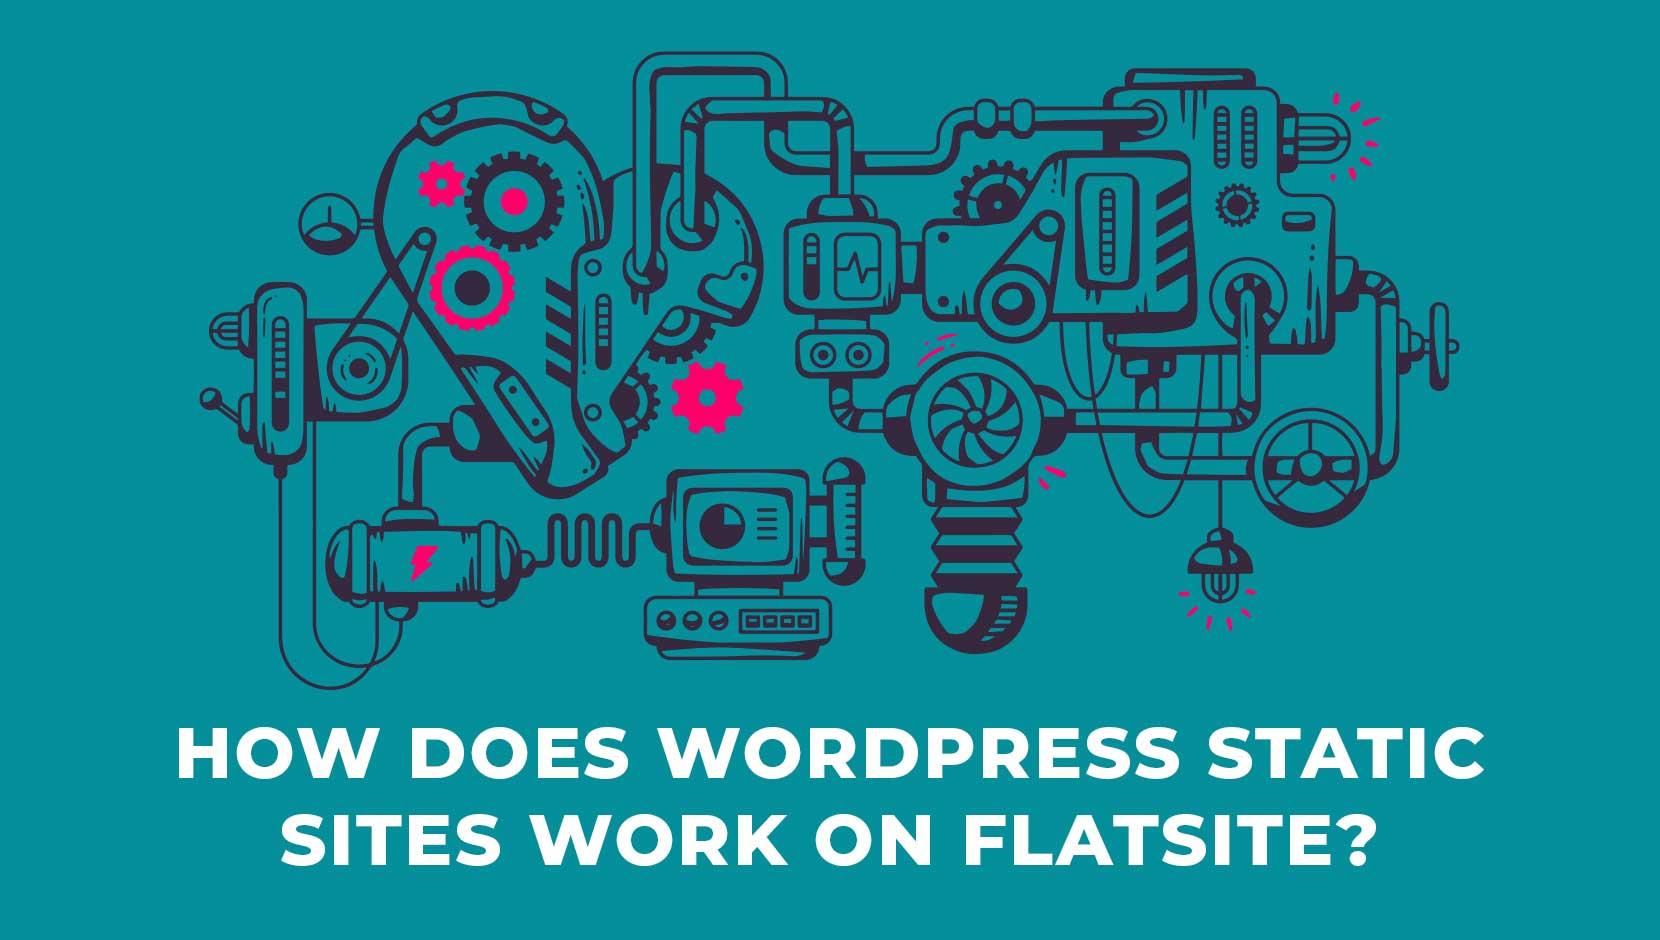 How Does WordPress Static Sites Work on FLATsite?